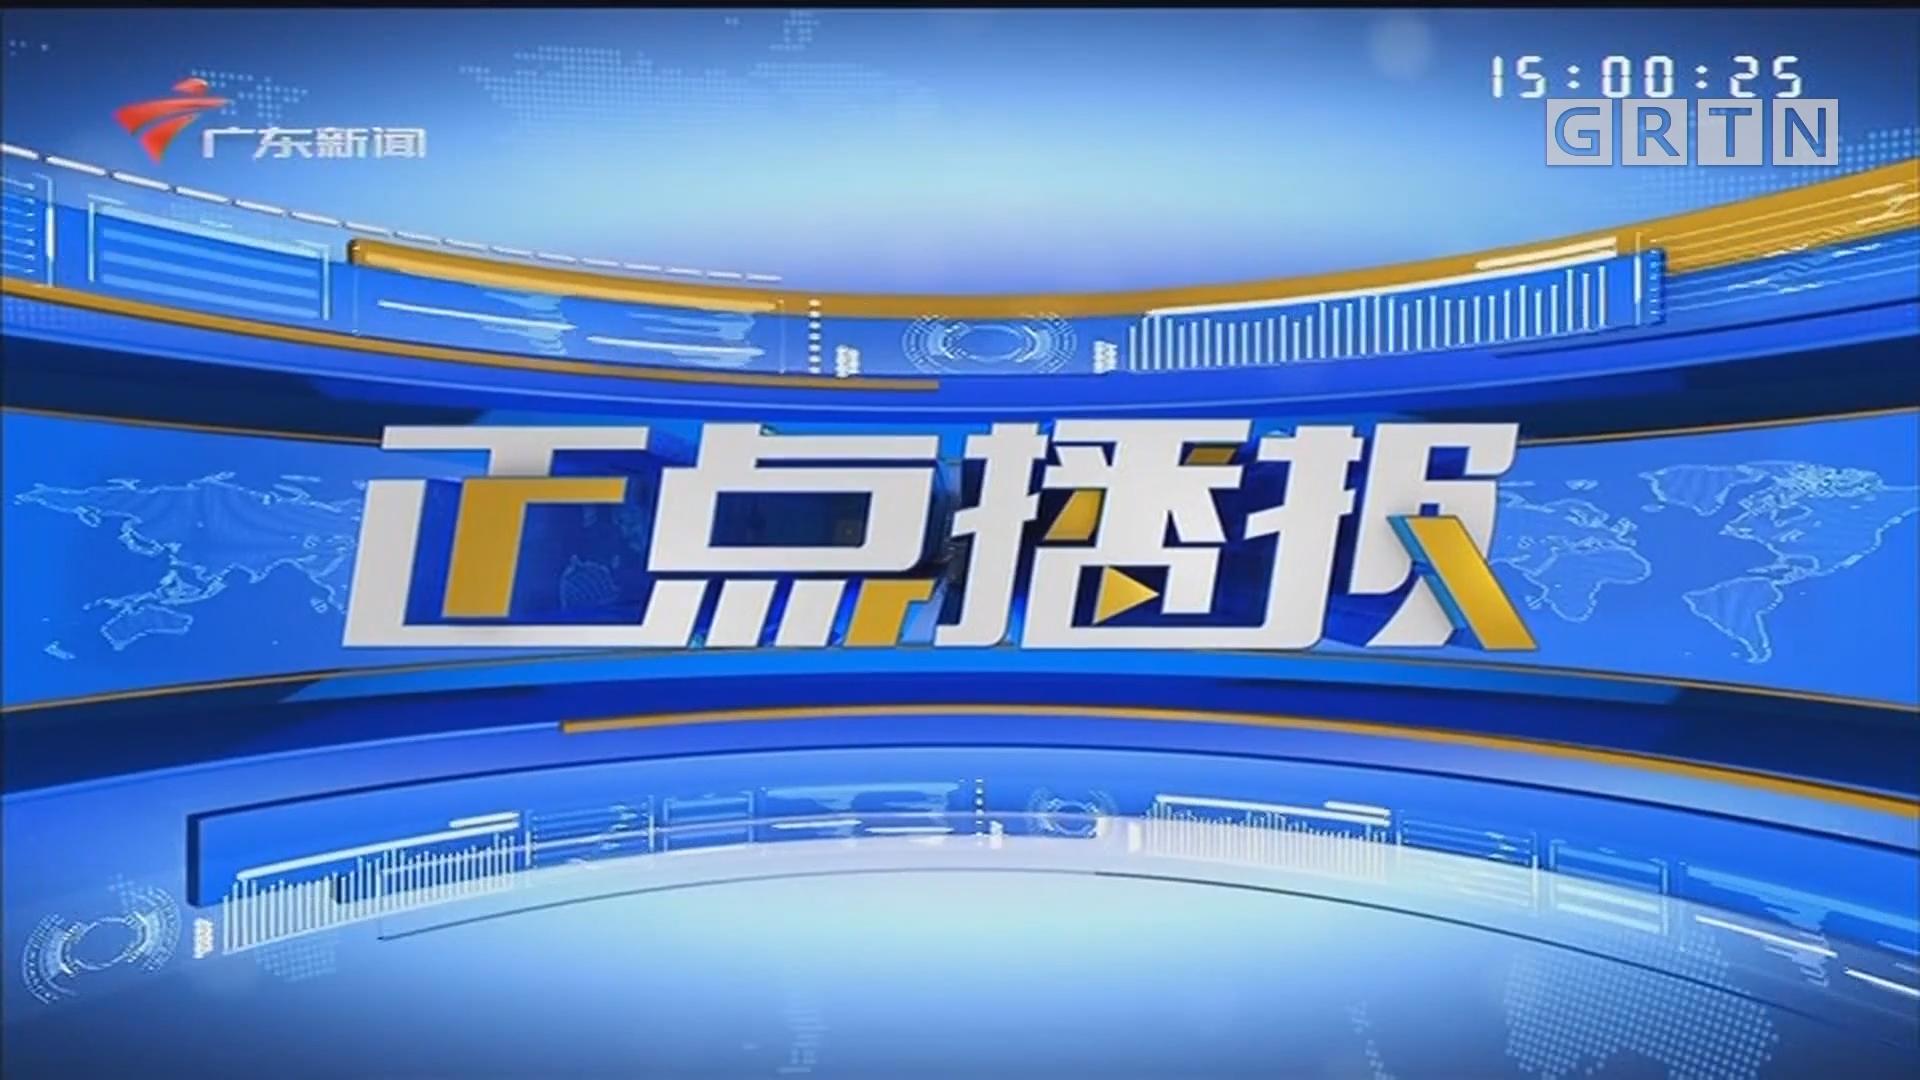 [HD][2020-05-02-15:00]正點播報:五一小長假首日:廣州南站出現出行小高峰